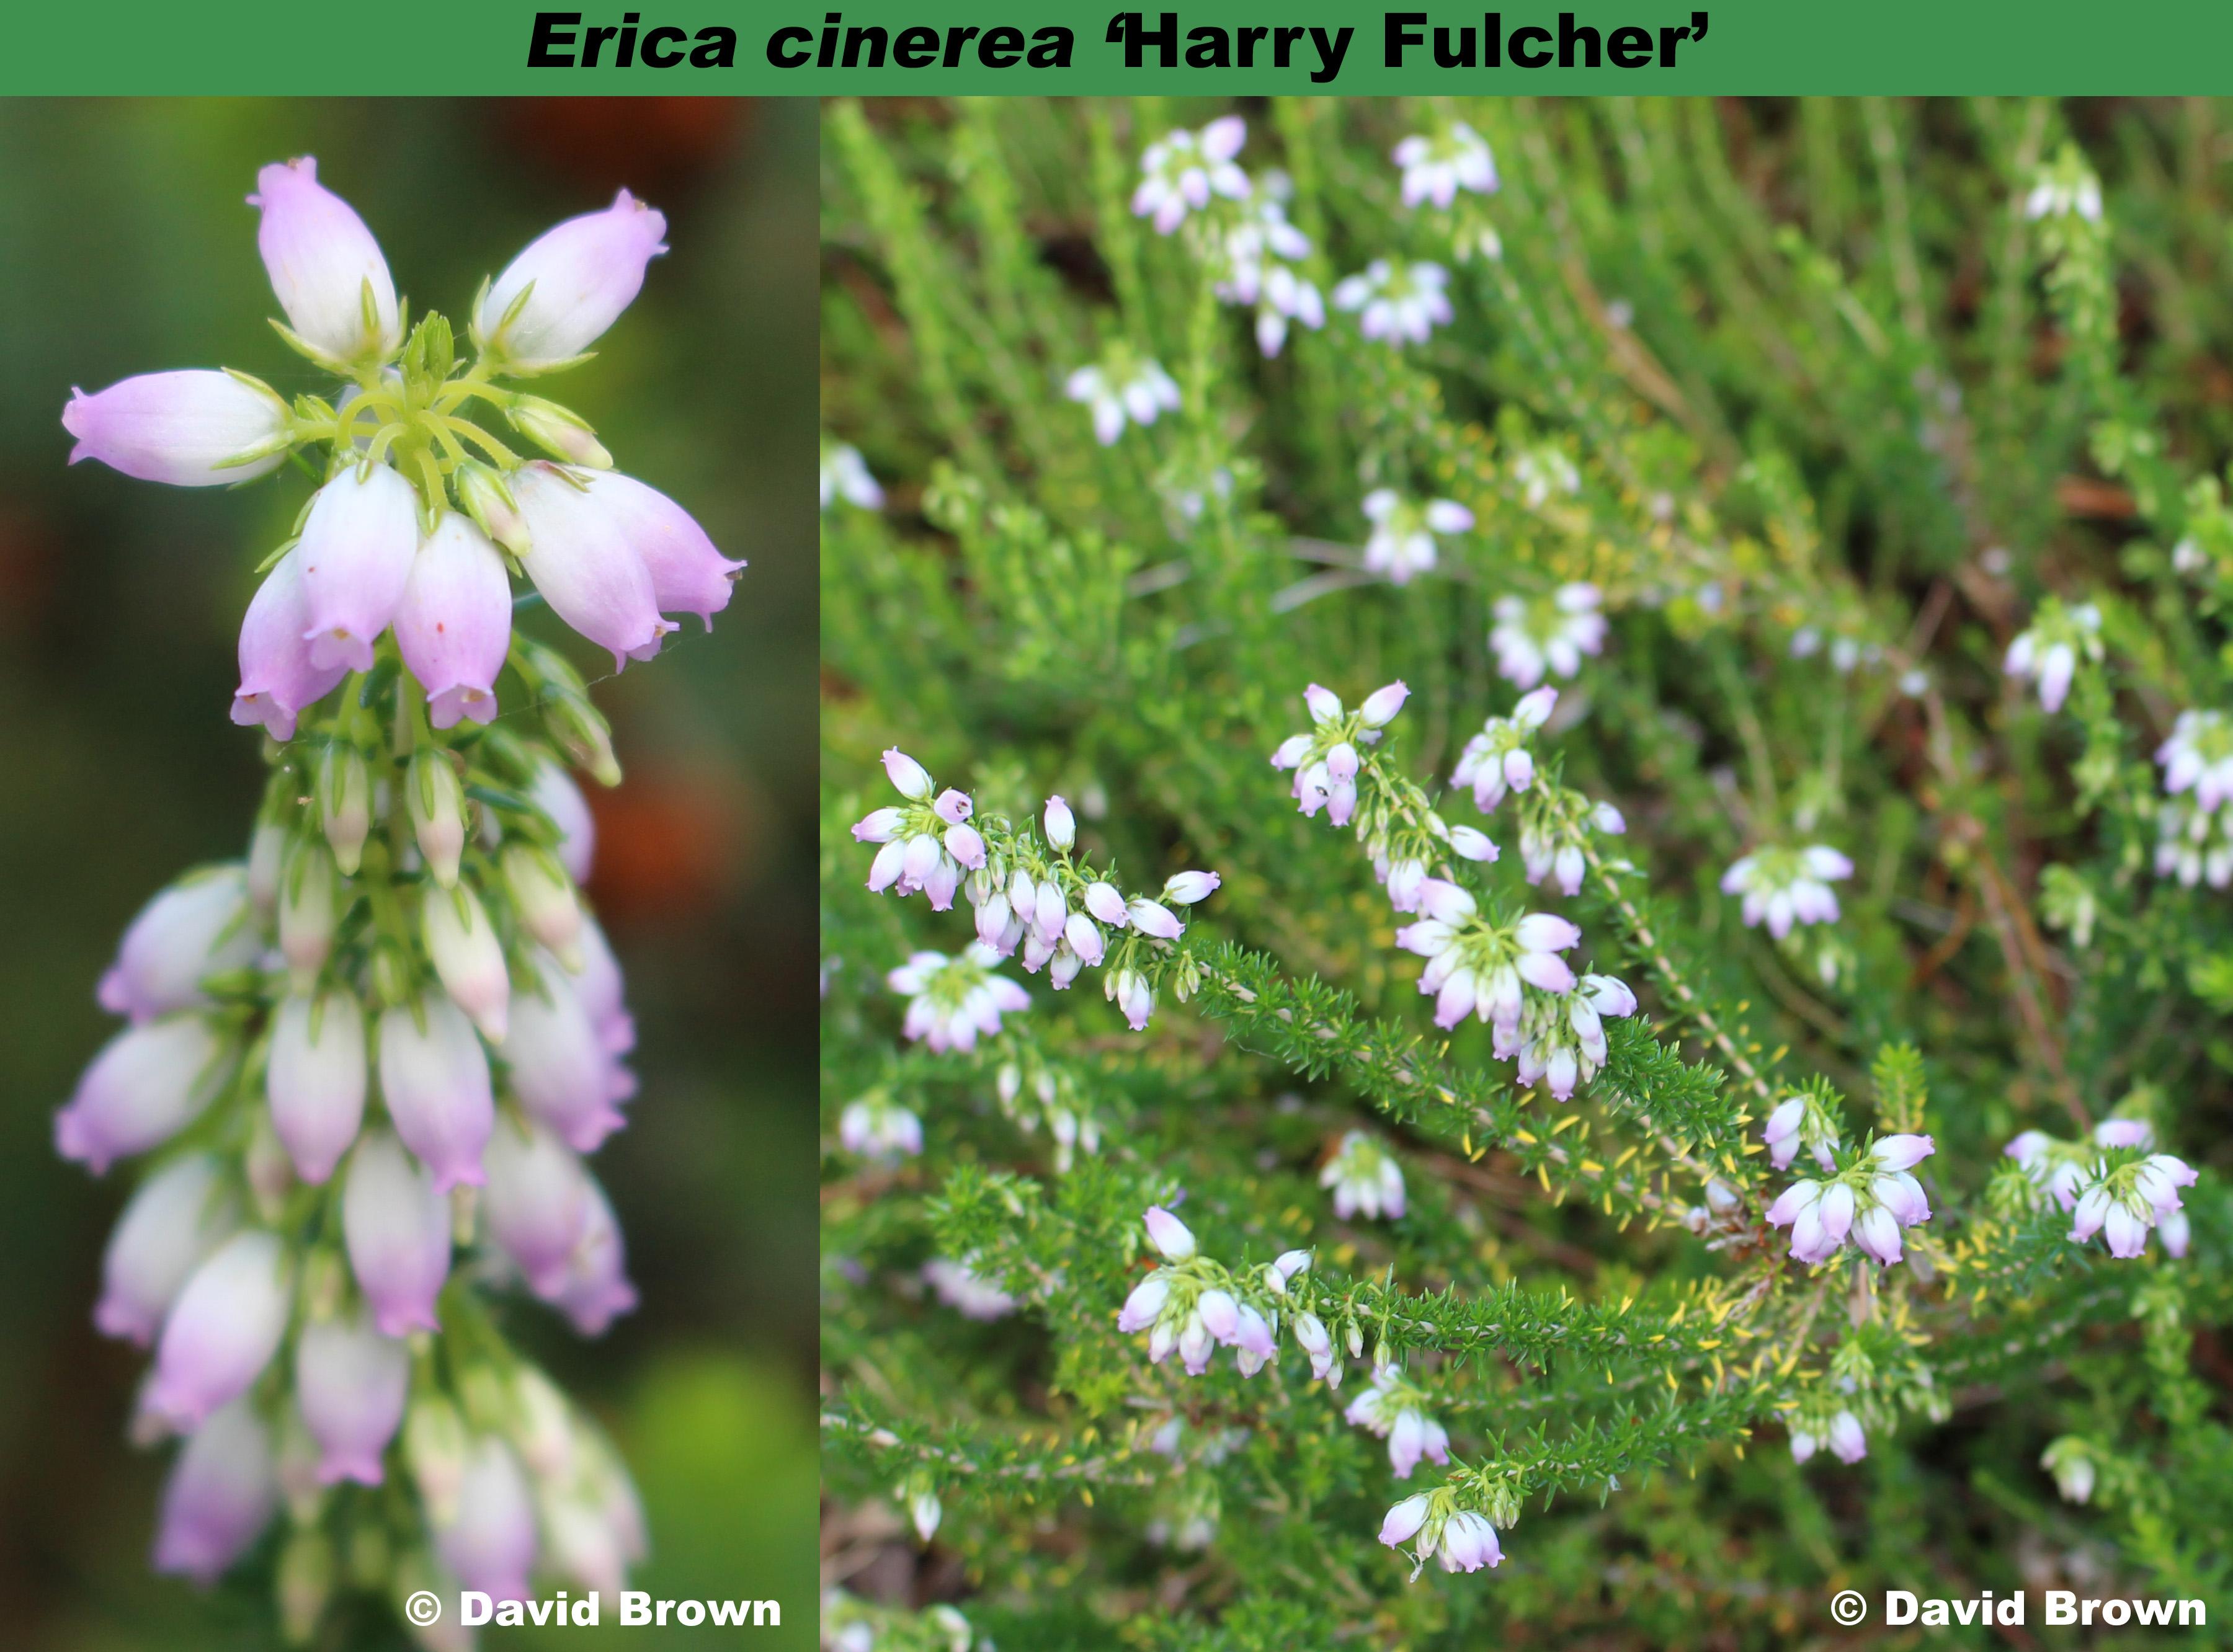 'Harry Fulcher'